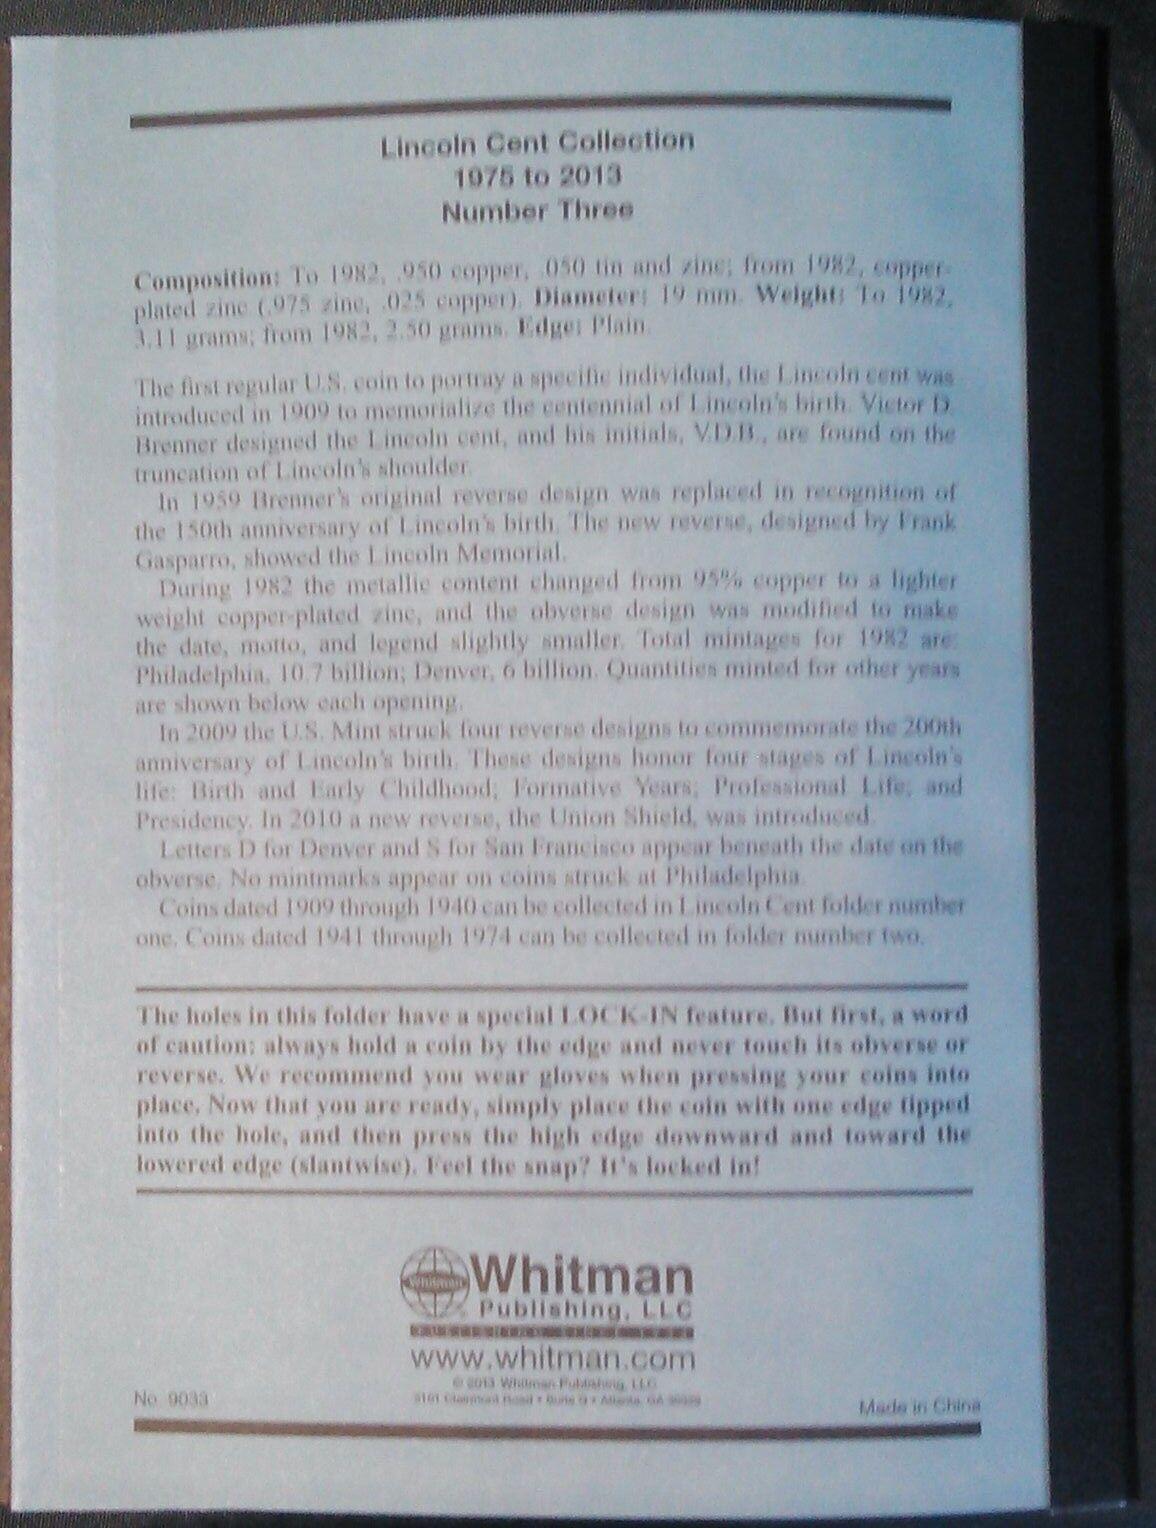 Whitman Lincoln Cents Vol. #3 1975-2013 Coin Folder, Penny Album Book # 9033